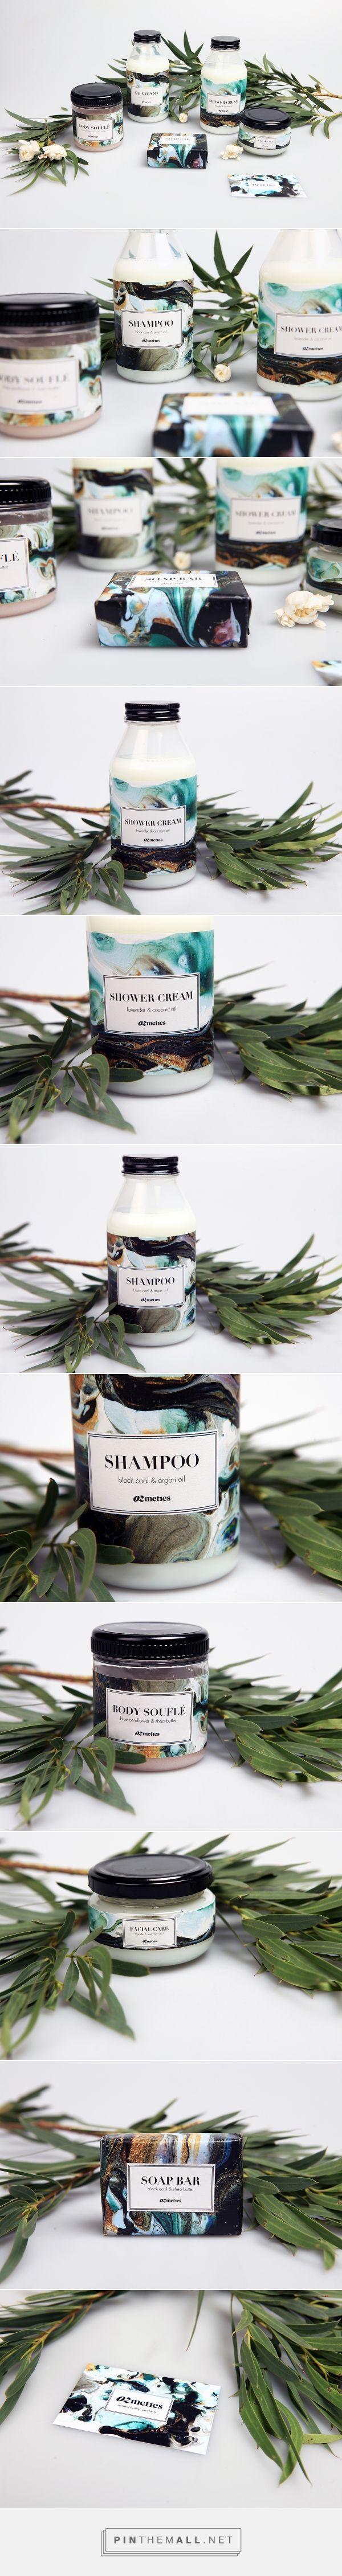 OZMETICS - Natural beauty products by Sara Ozvaldic